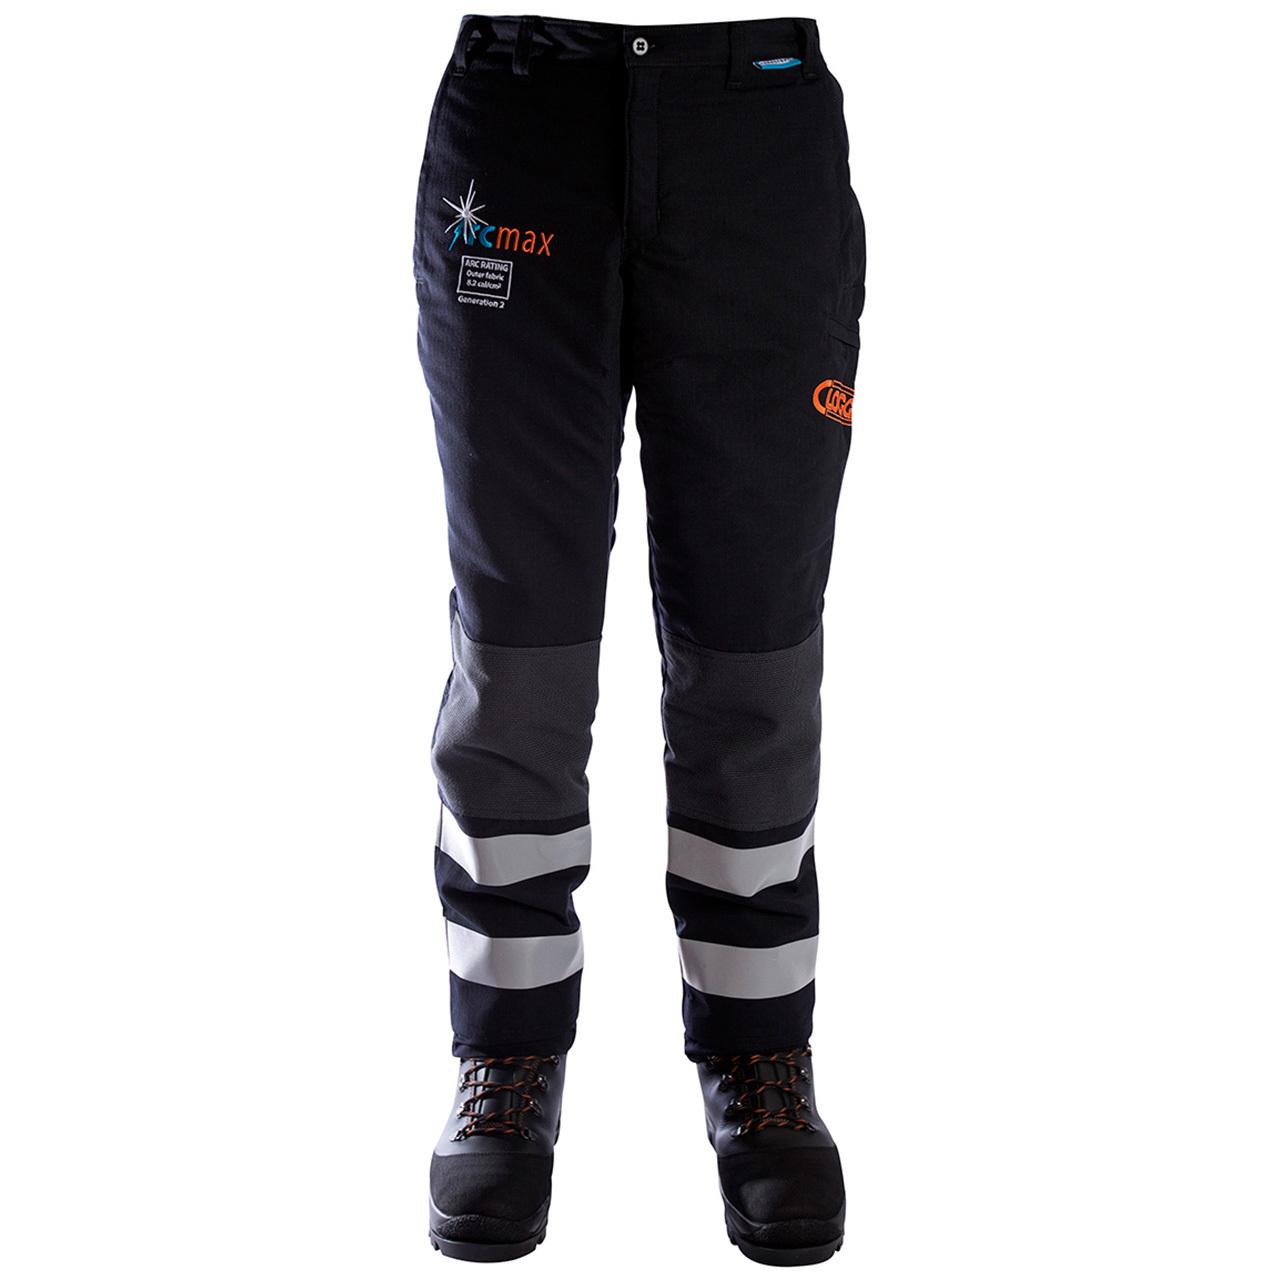 Clogger Arcmax Premium Arc Rated Fire Resistant Men's Chainsaw Pants